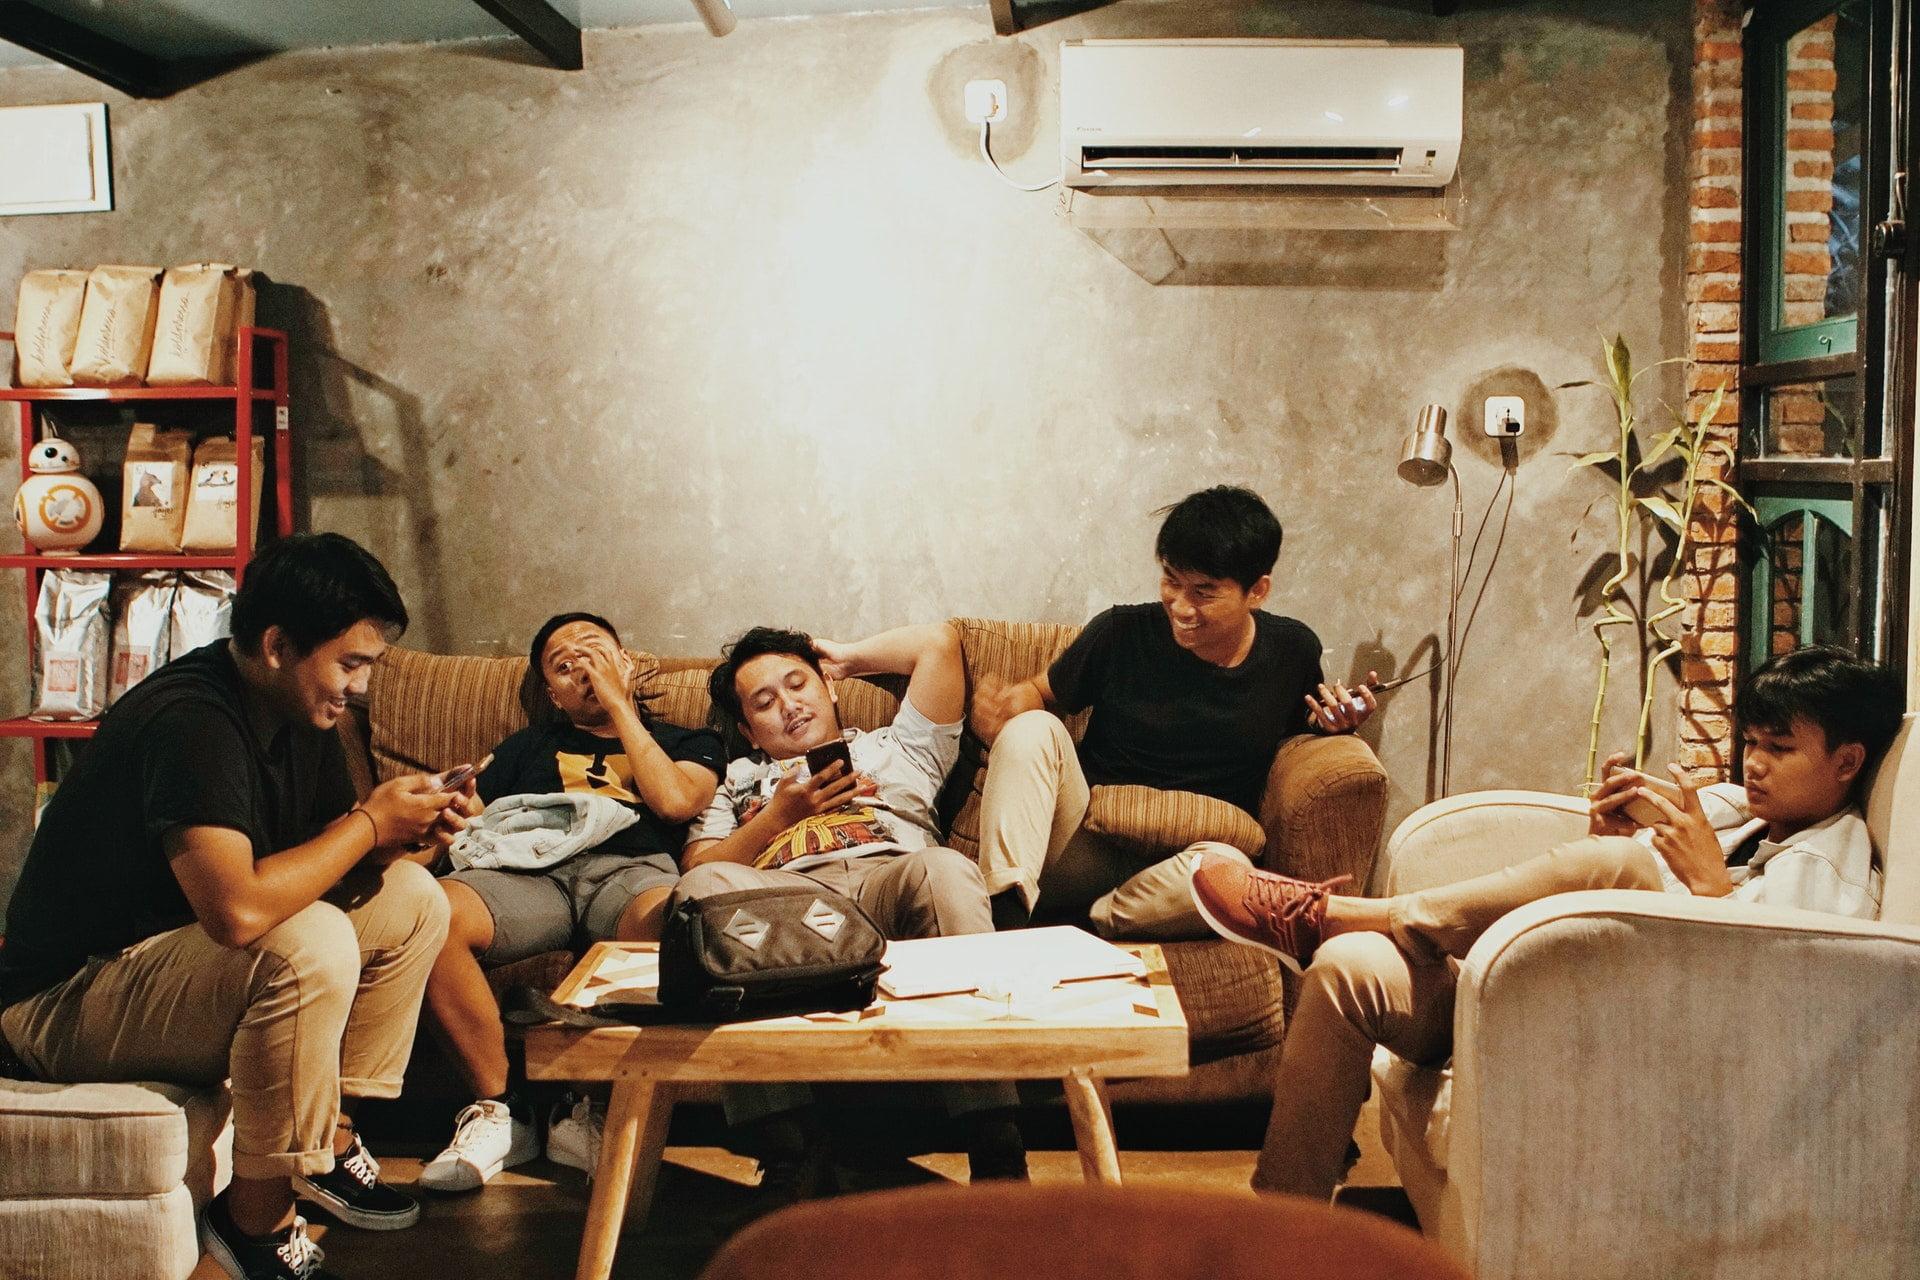 boys cellphone facial expression friends 友人|海詩楓詩選